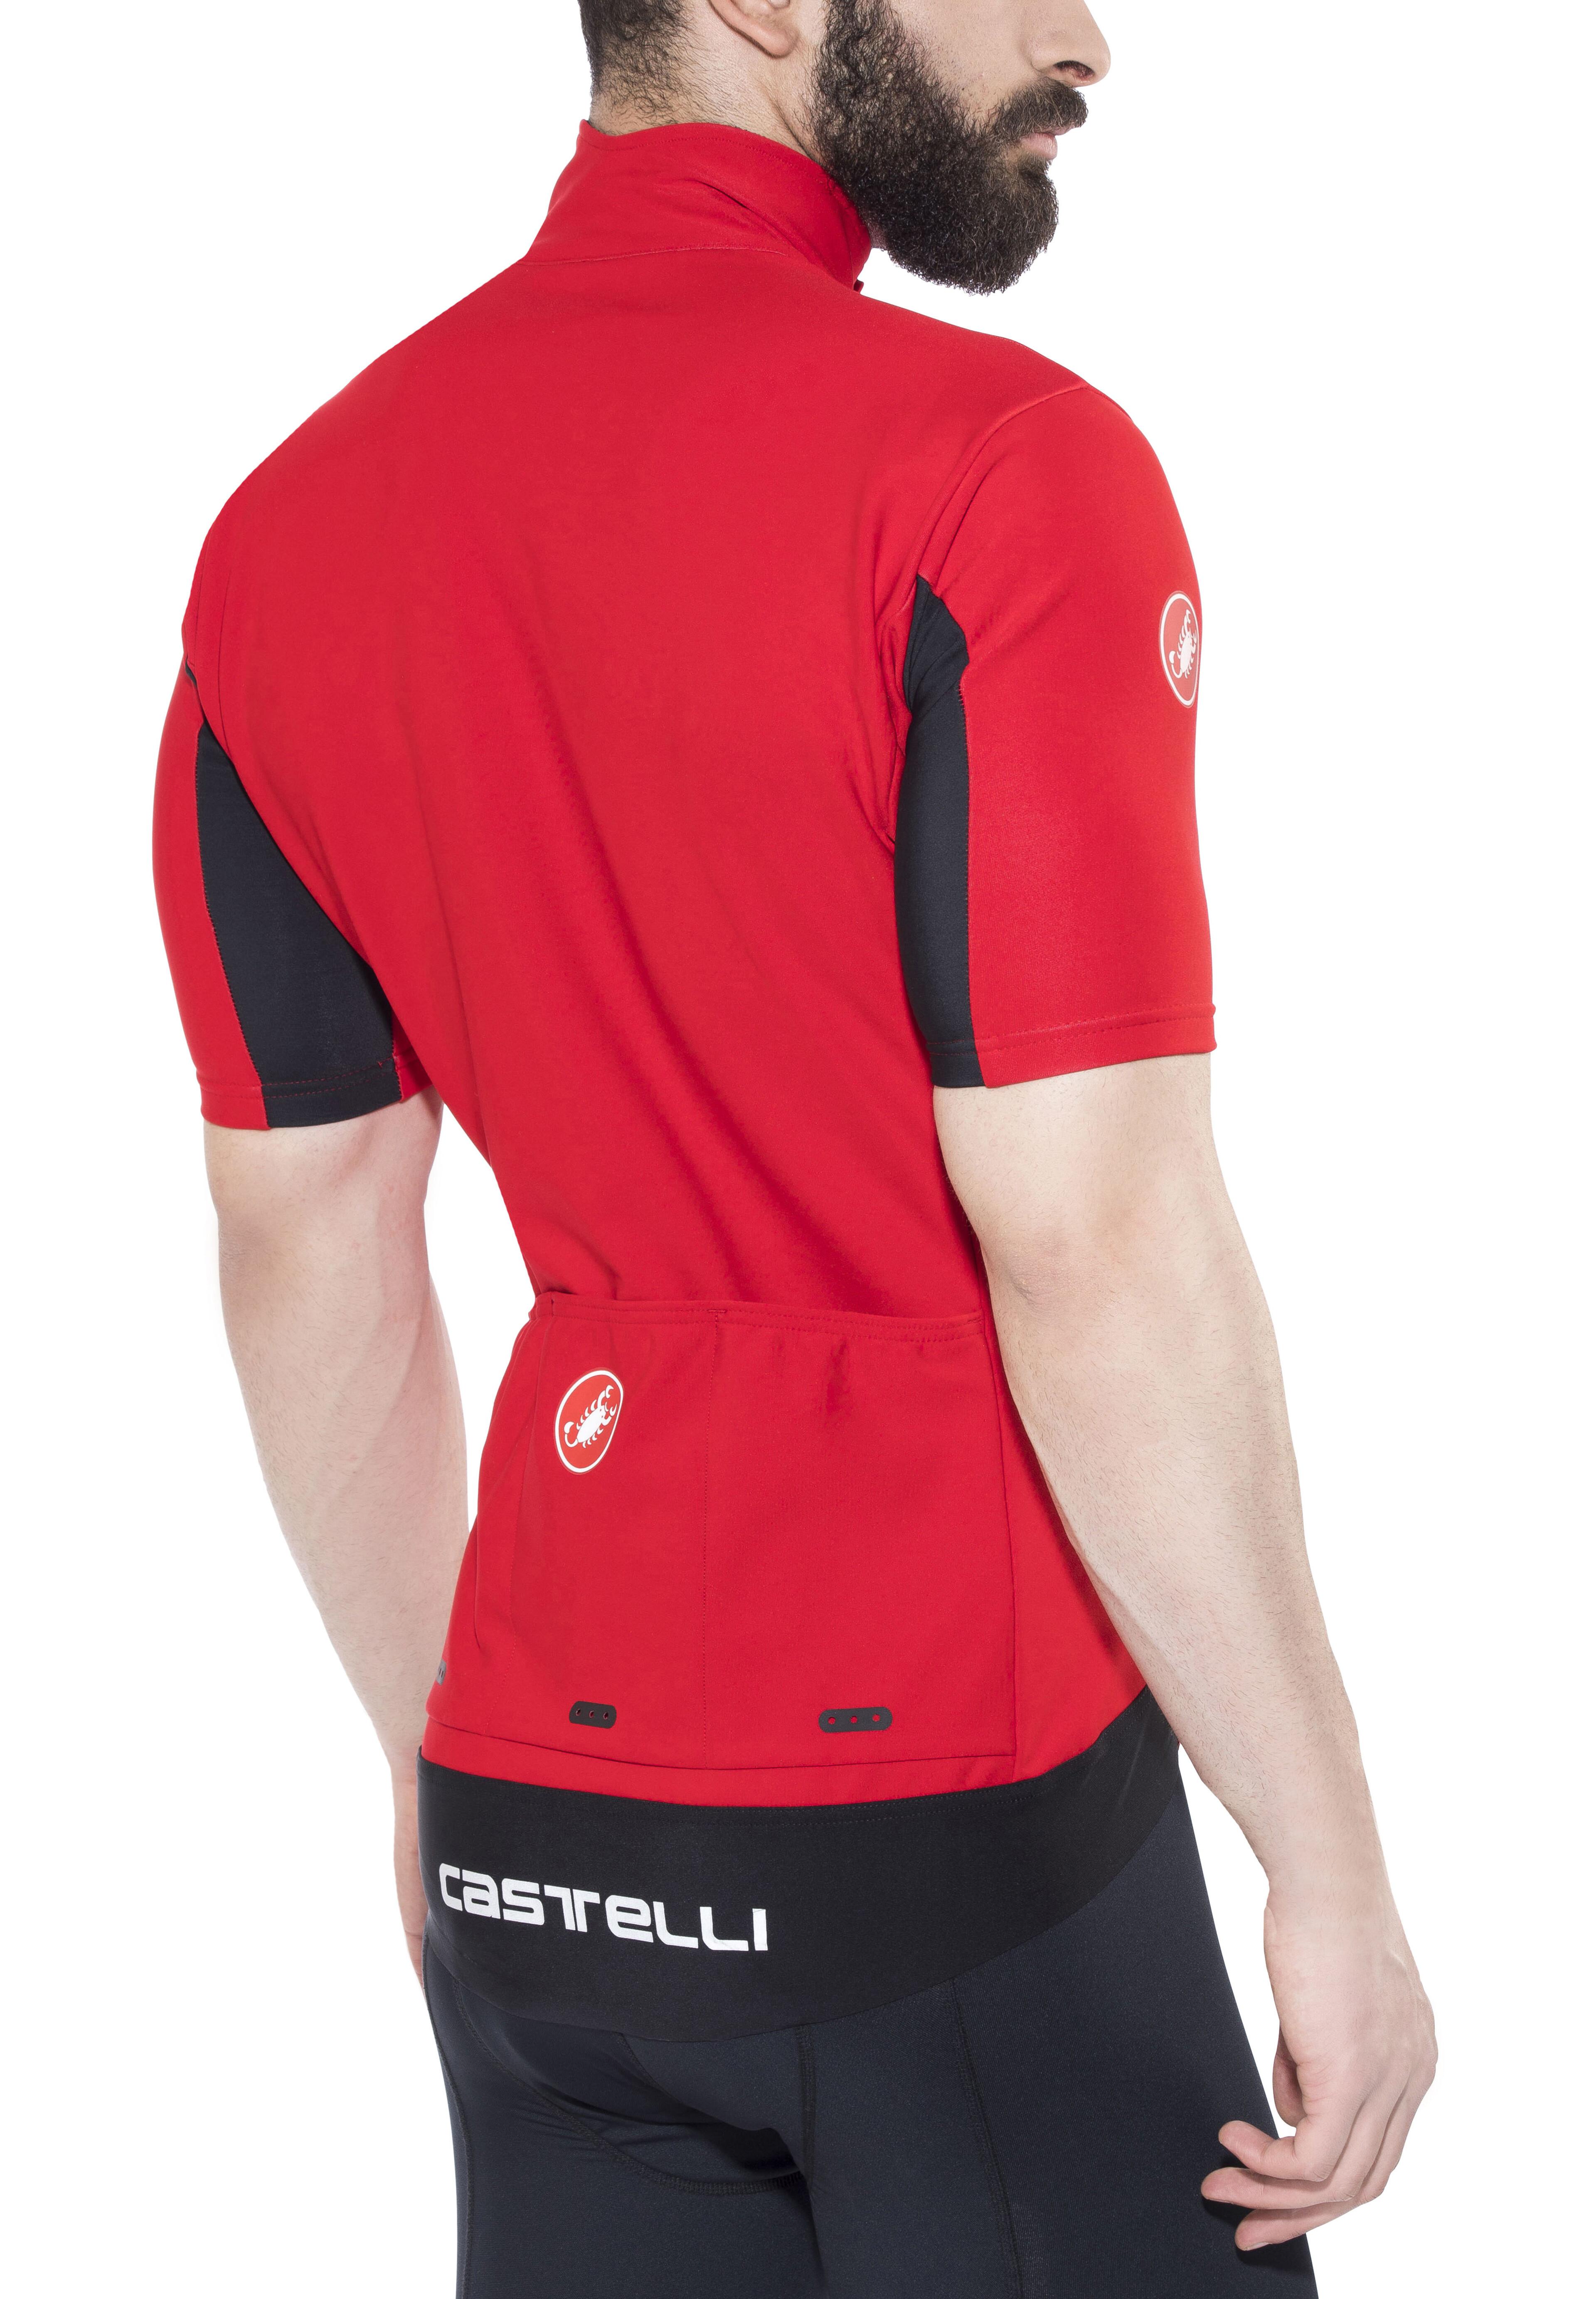 Castelli Gabba 3 Bike Jersey Shortsleeve Men red at Bikester.co.uk b69cda2ae